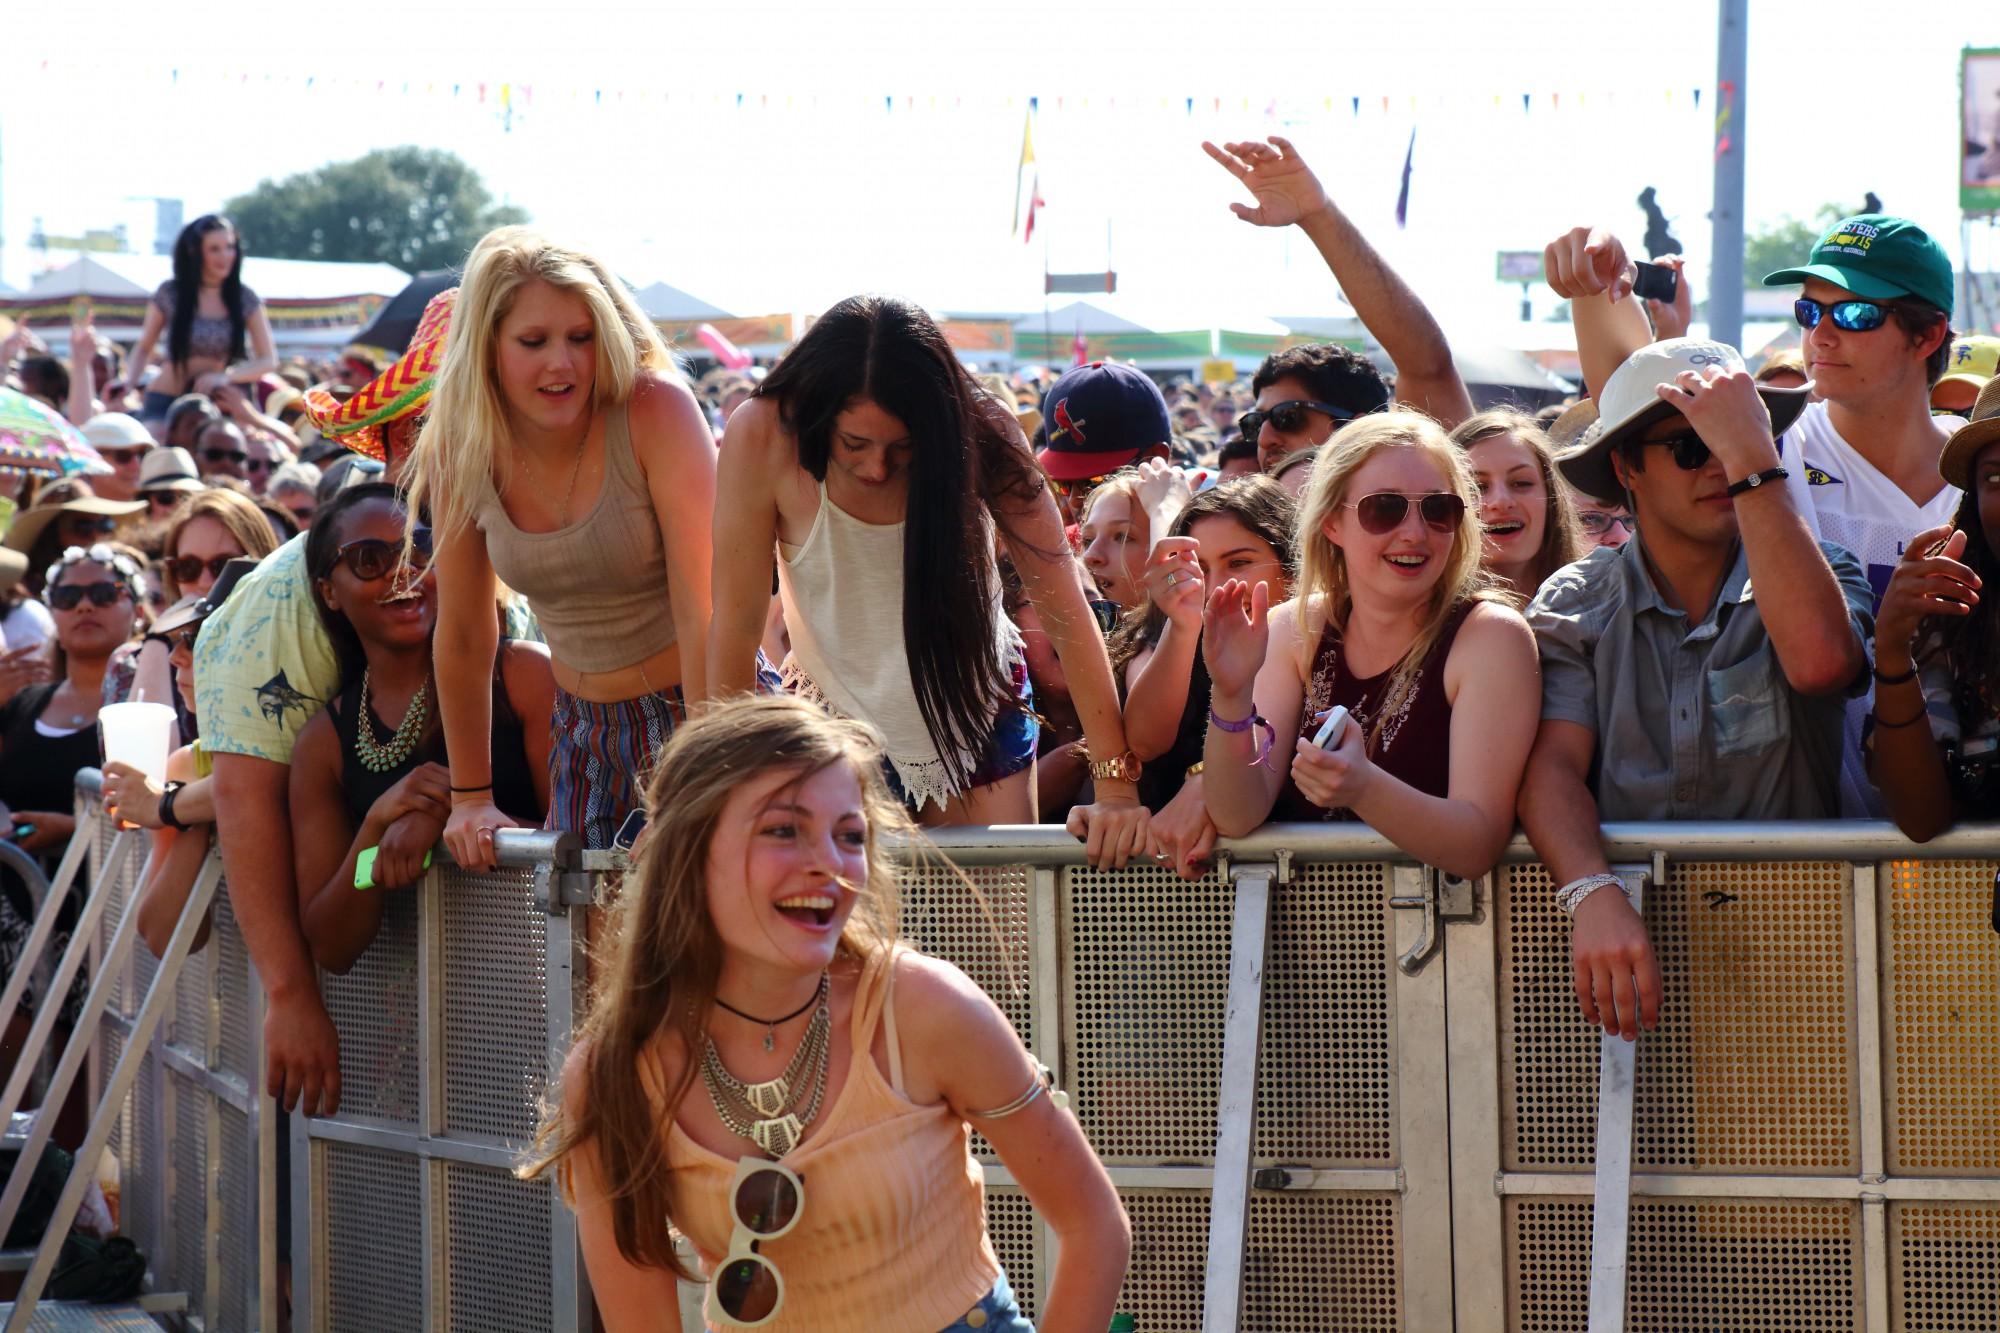 Big Freedia crowd